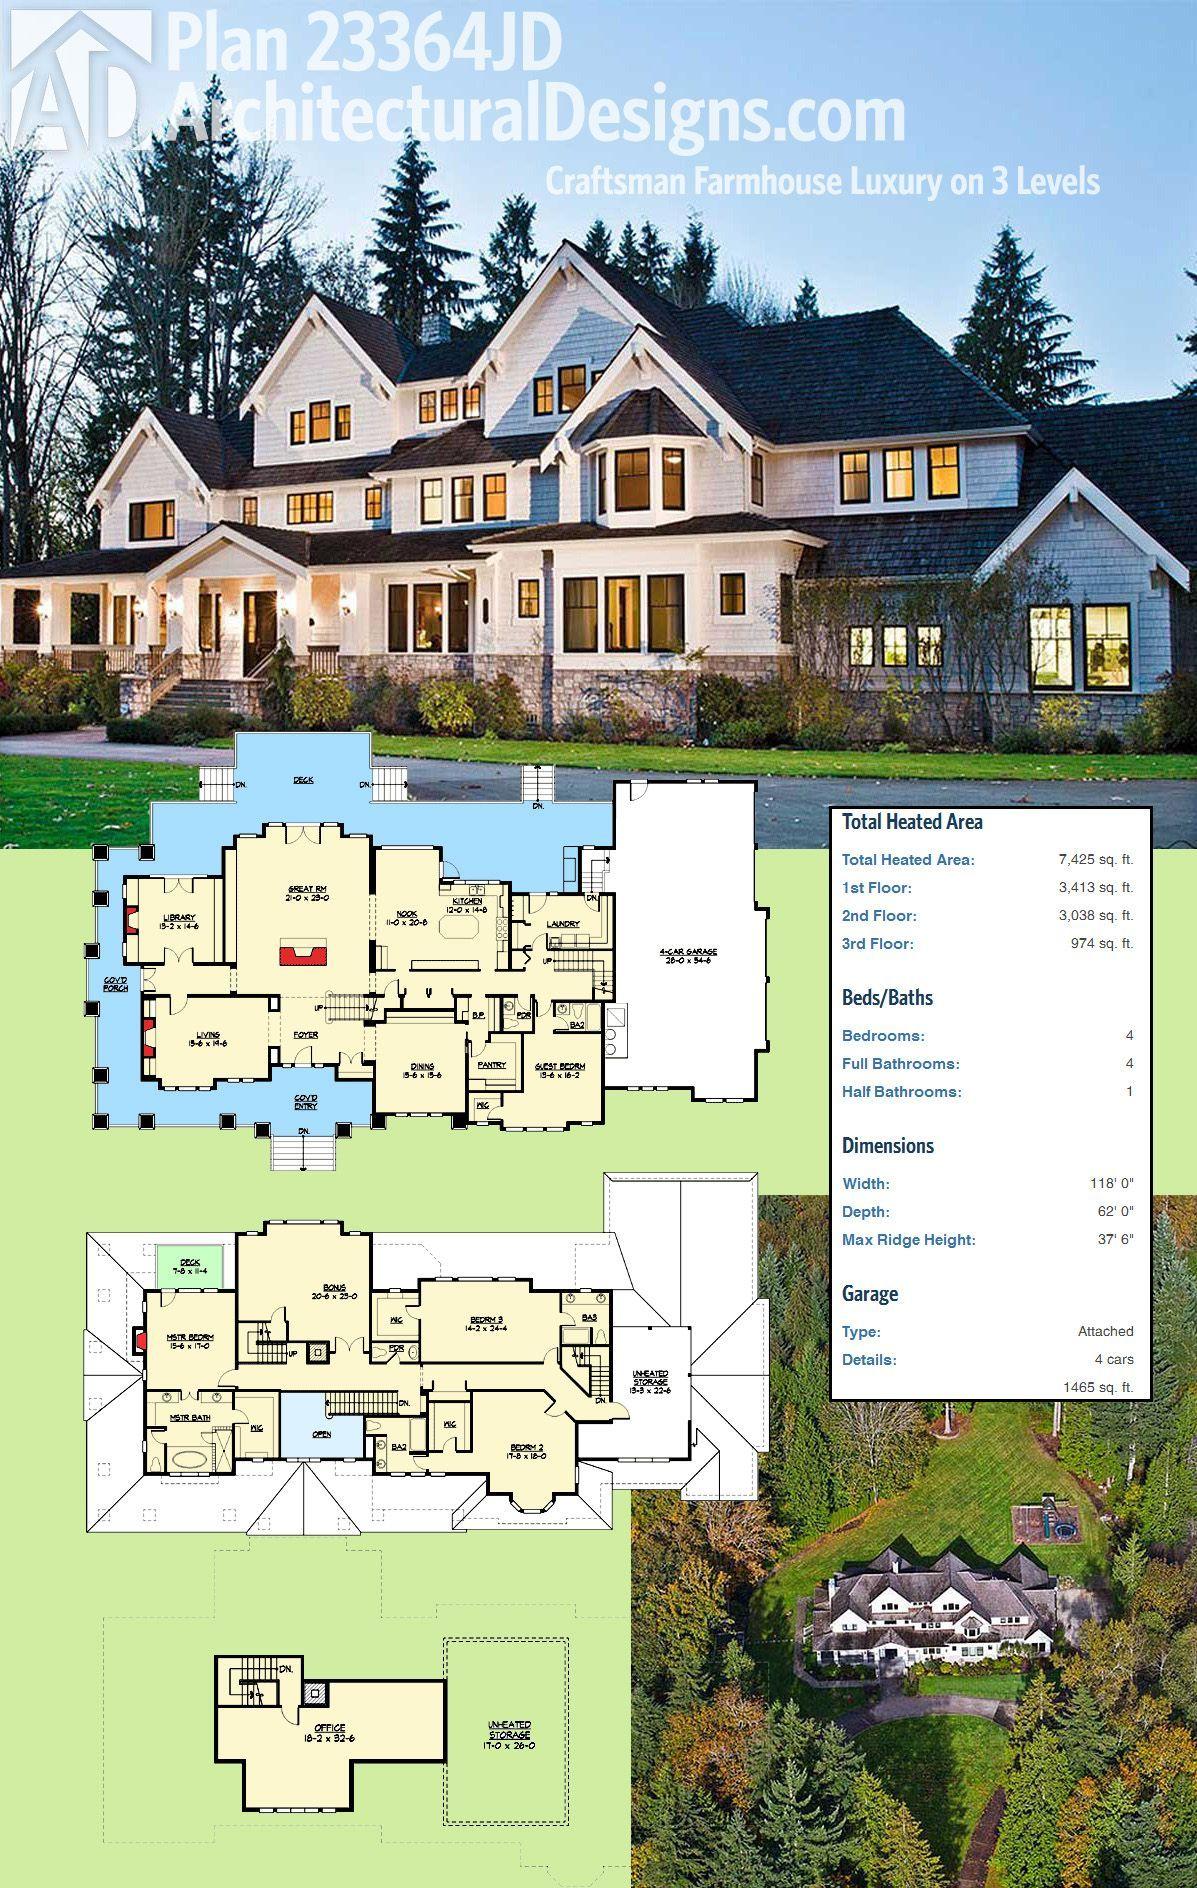 Architectural Designs Luxury Craftsman Farmhouse Plan 23364JD